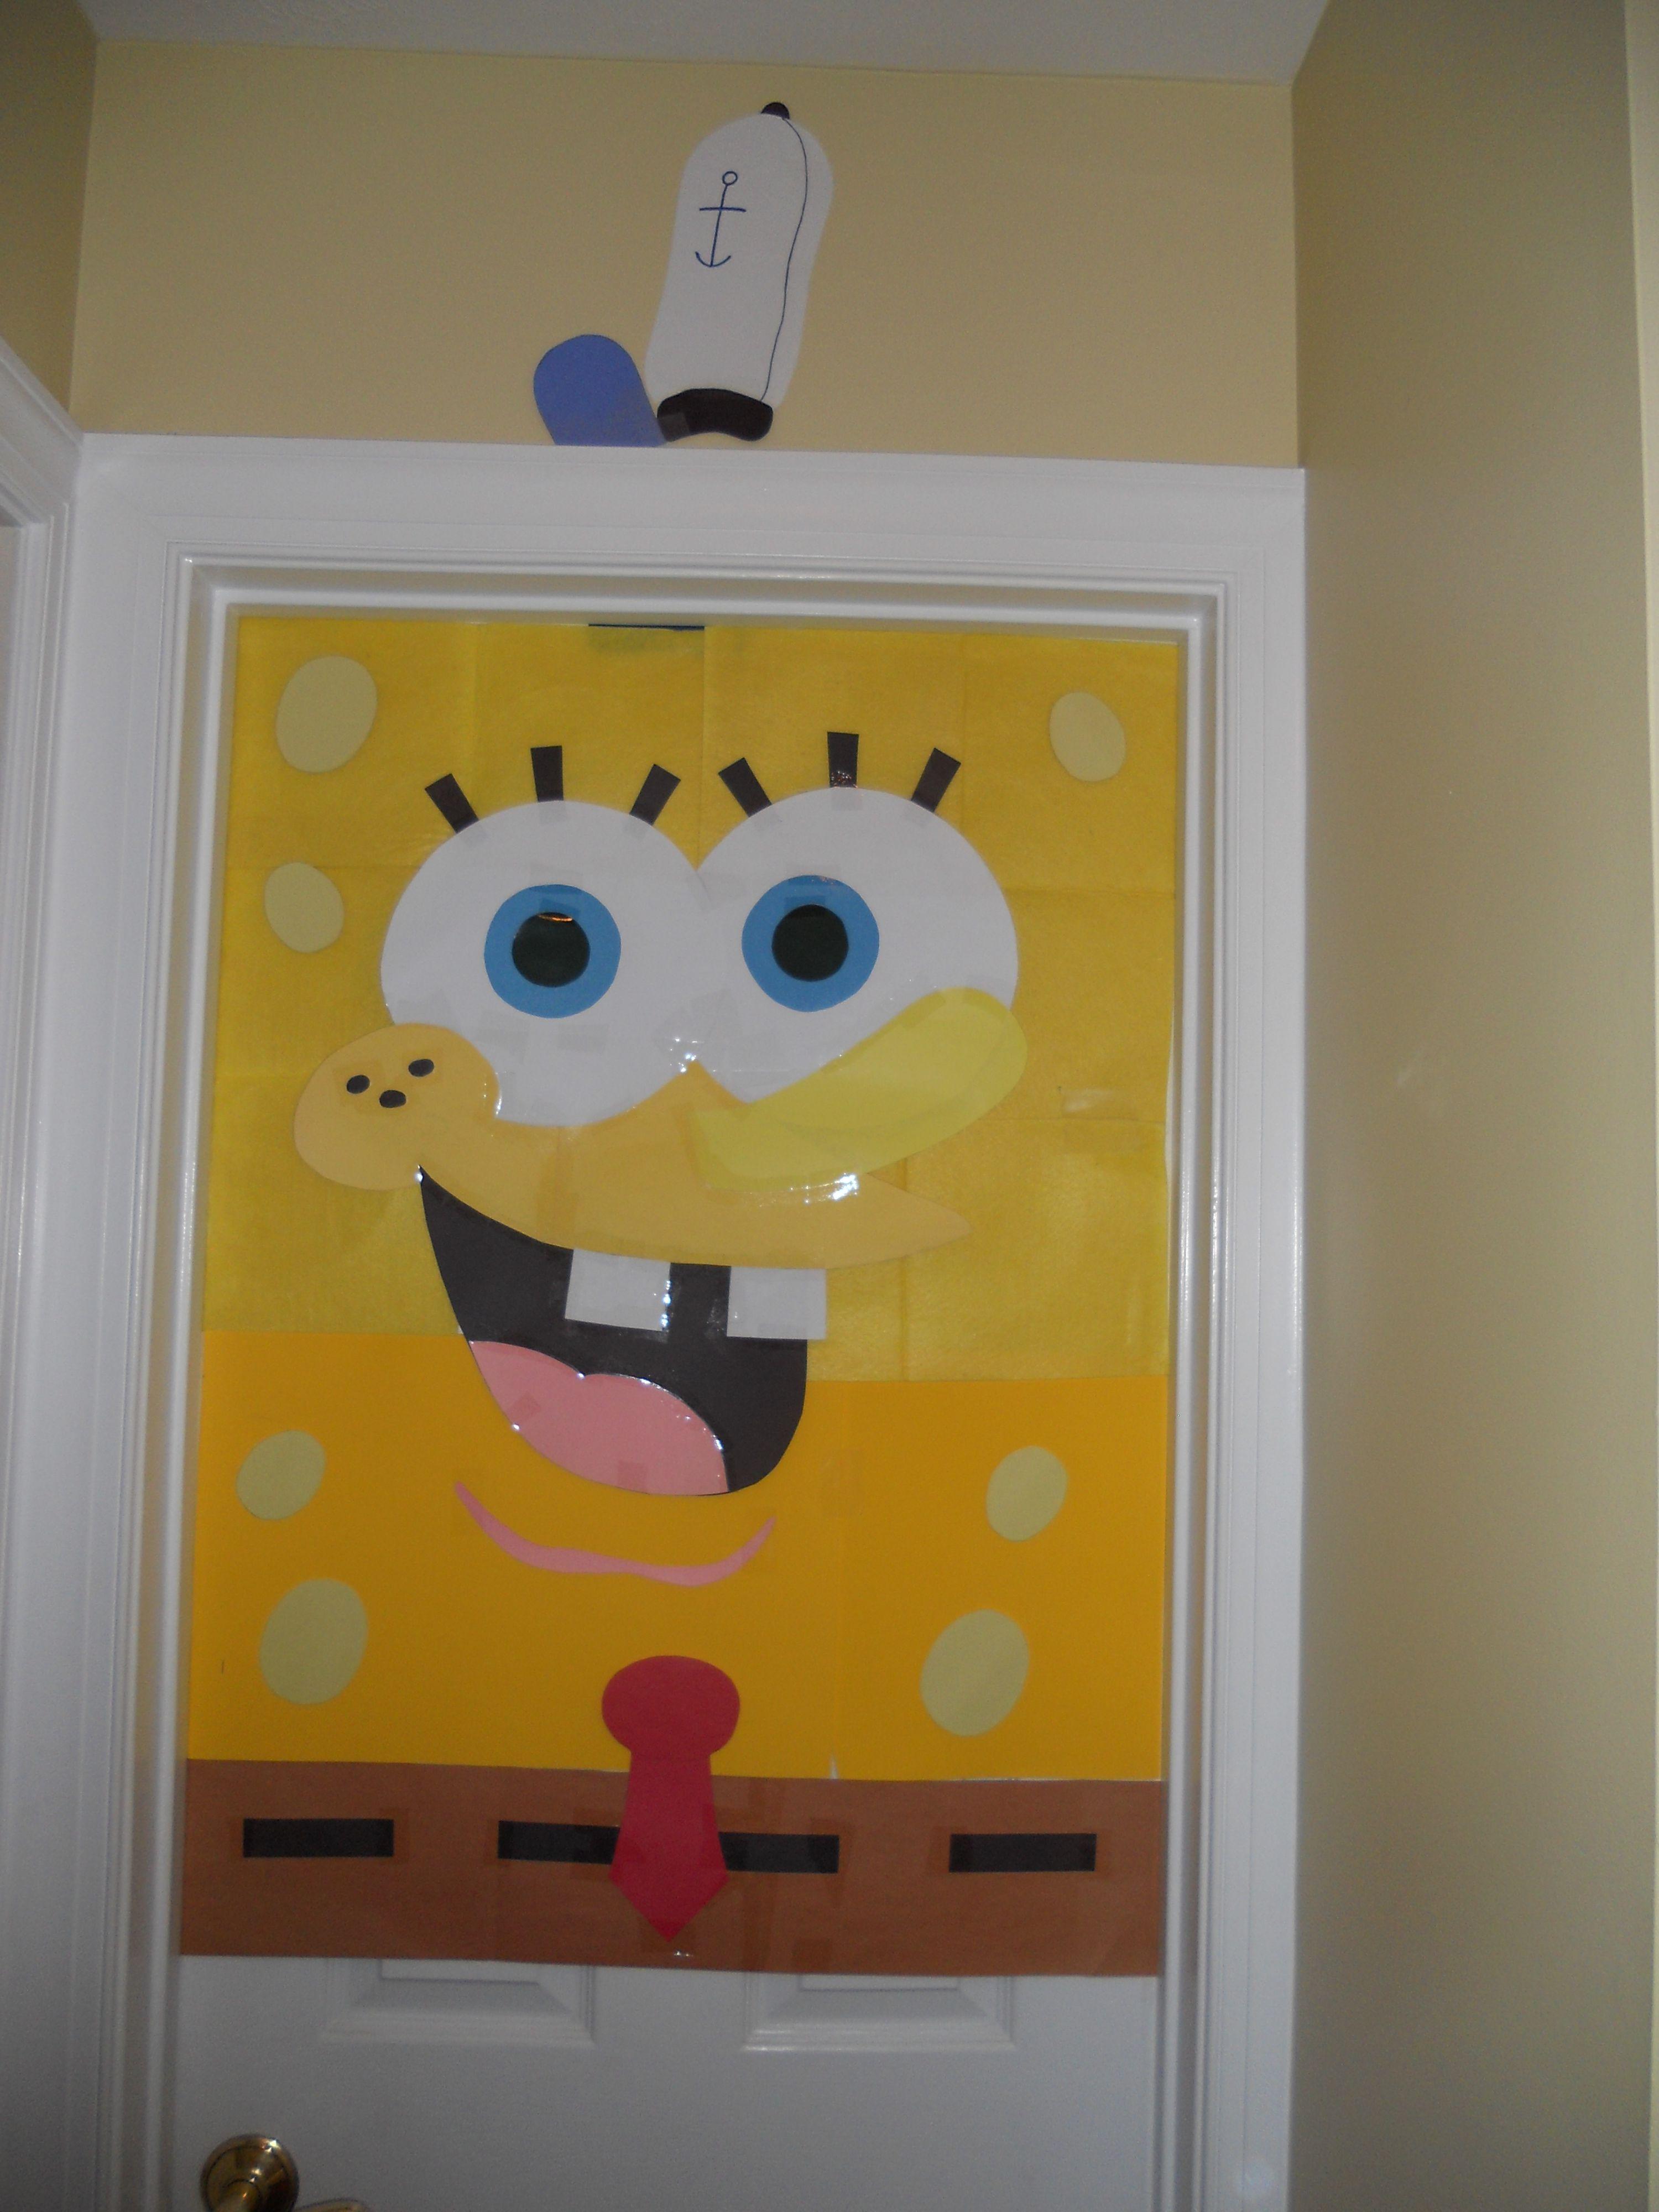 Home-made Spongebob door decoration. Made with ...